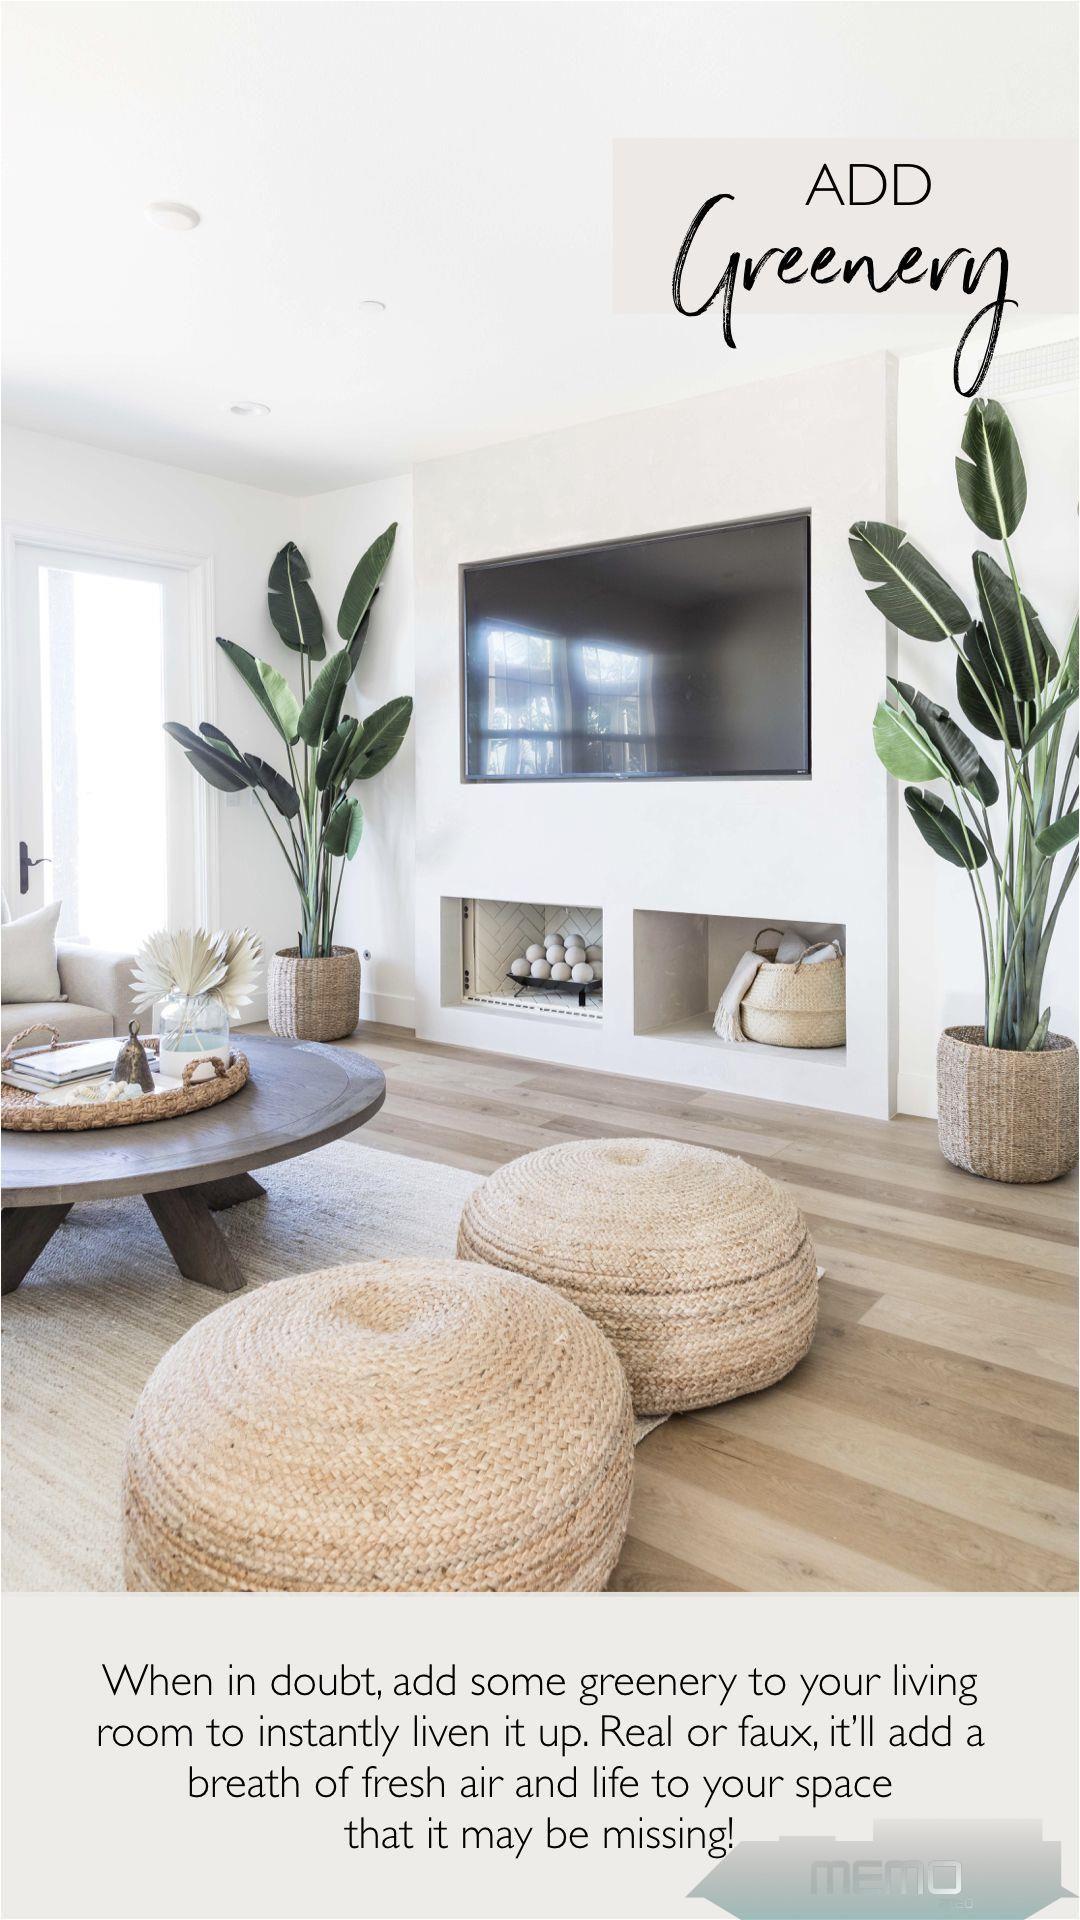 Jun 3, 2020 - Living Room Essentials | INTERIOR DESIGN TIPS AND TRICK | #DesignTips #InteriorDesign #InteriorDesignTips #Tips #DecorTips #DesignGuide #InteriorDesignGuide #HomeDecor #livingroomessentials #homedecorate #homeorganizationideasclutter #homedecorshop #homeorganizationdiy